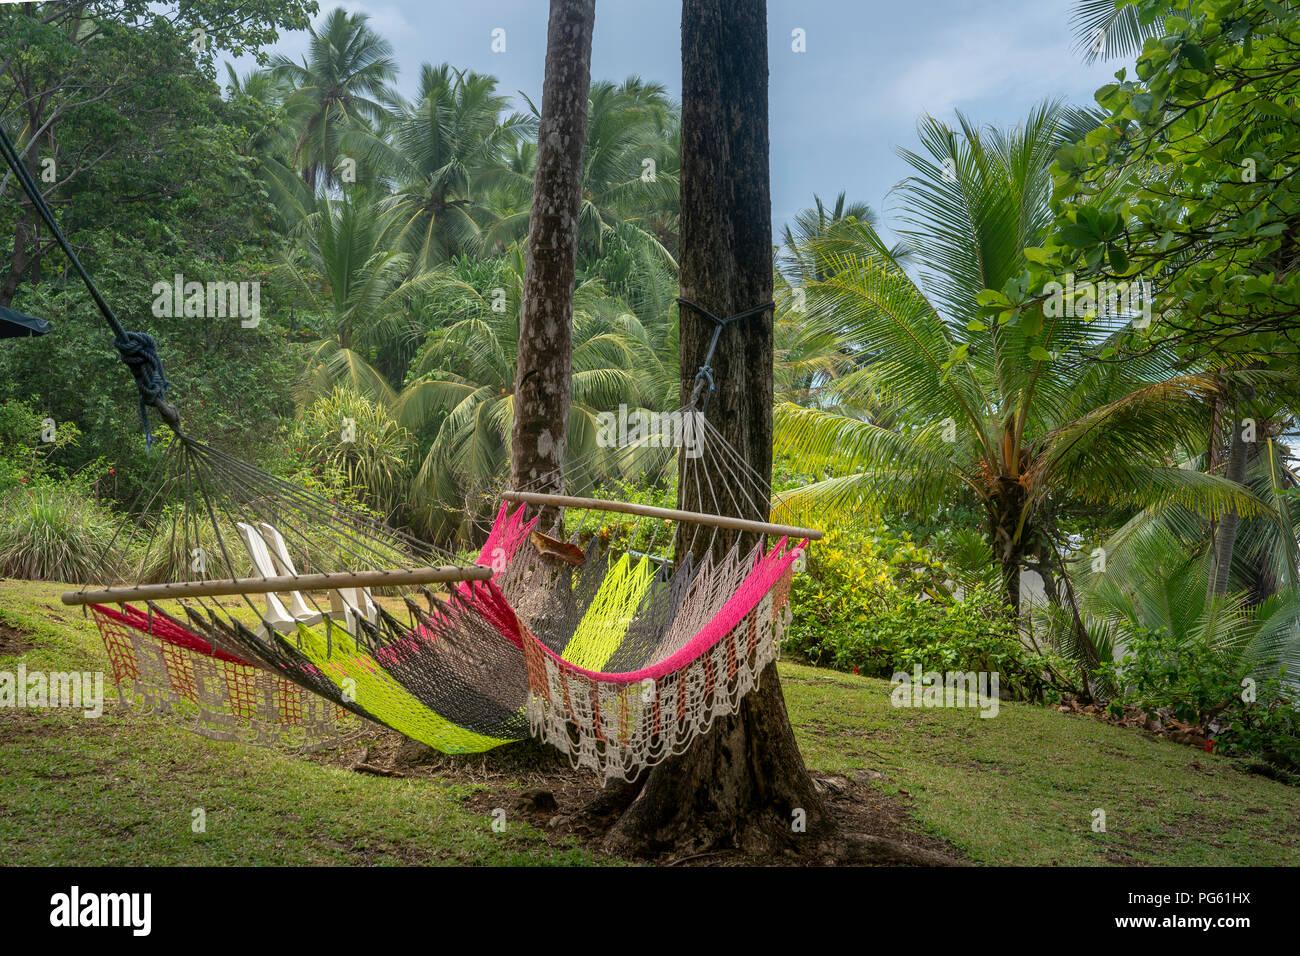 Hamac, parc national de Corcovado, péninsule d'Osa, au Costa Rica. Photo Stock